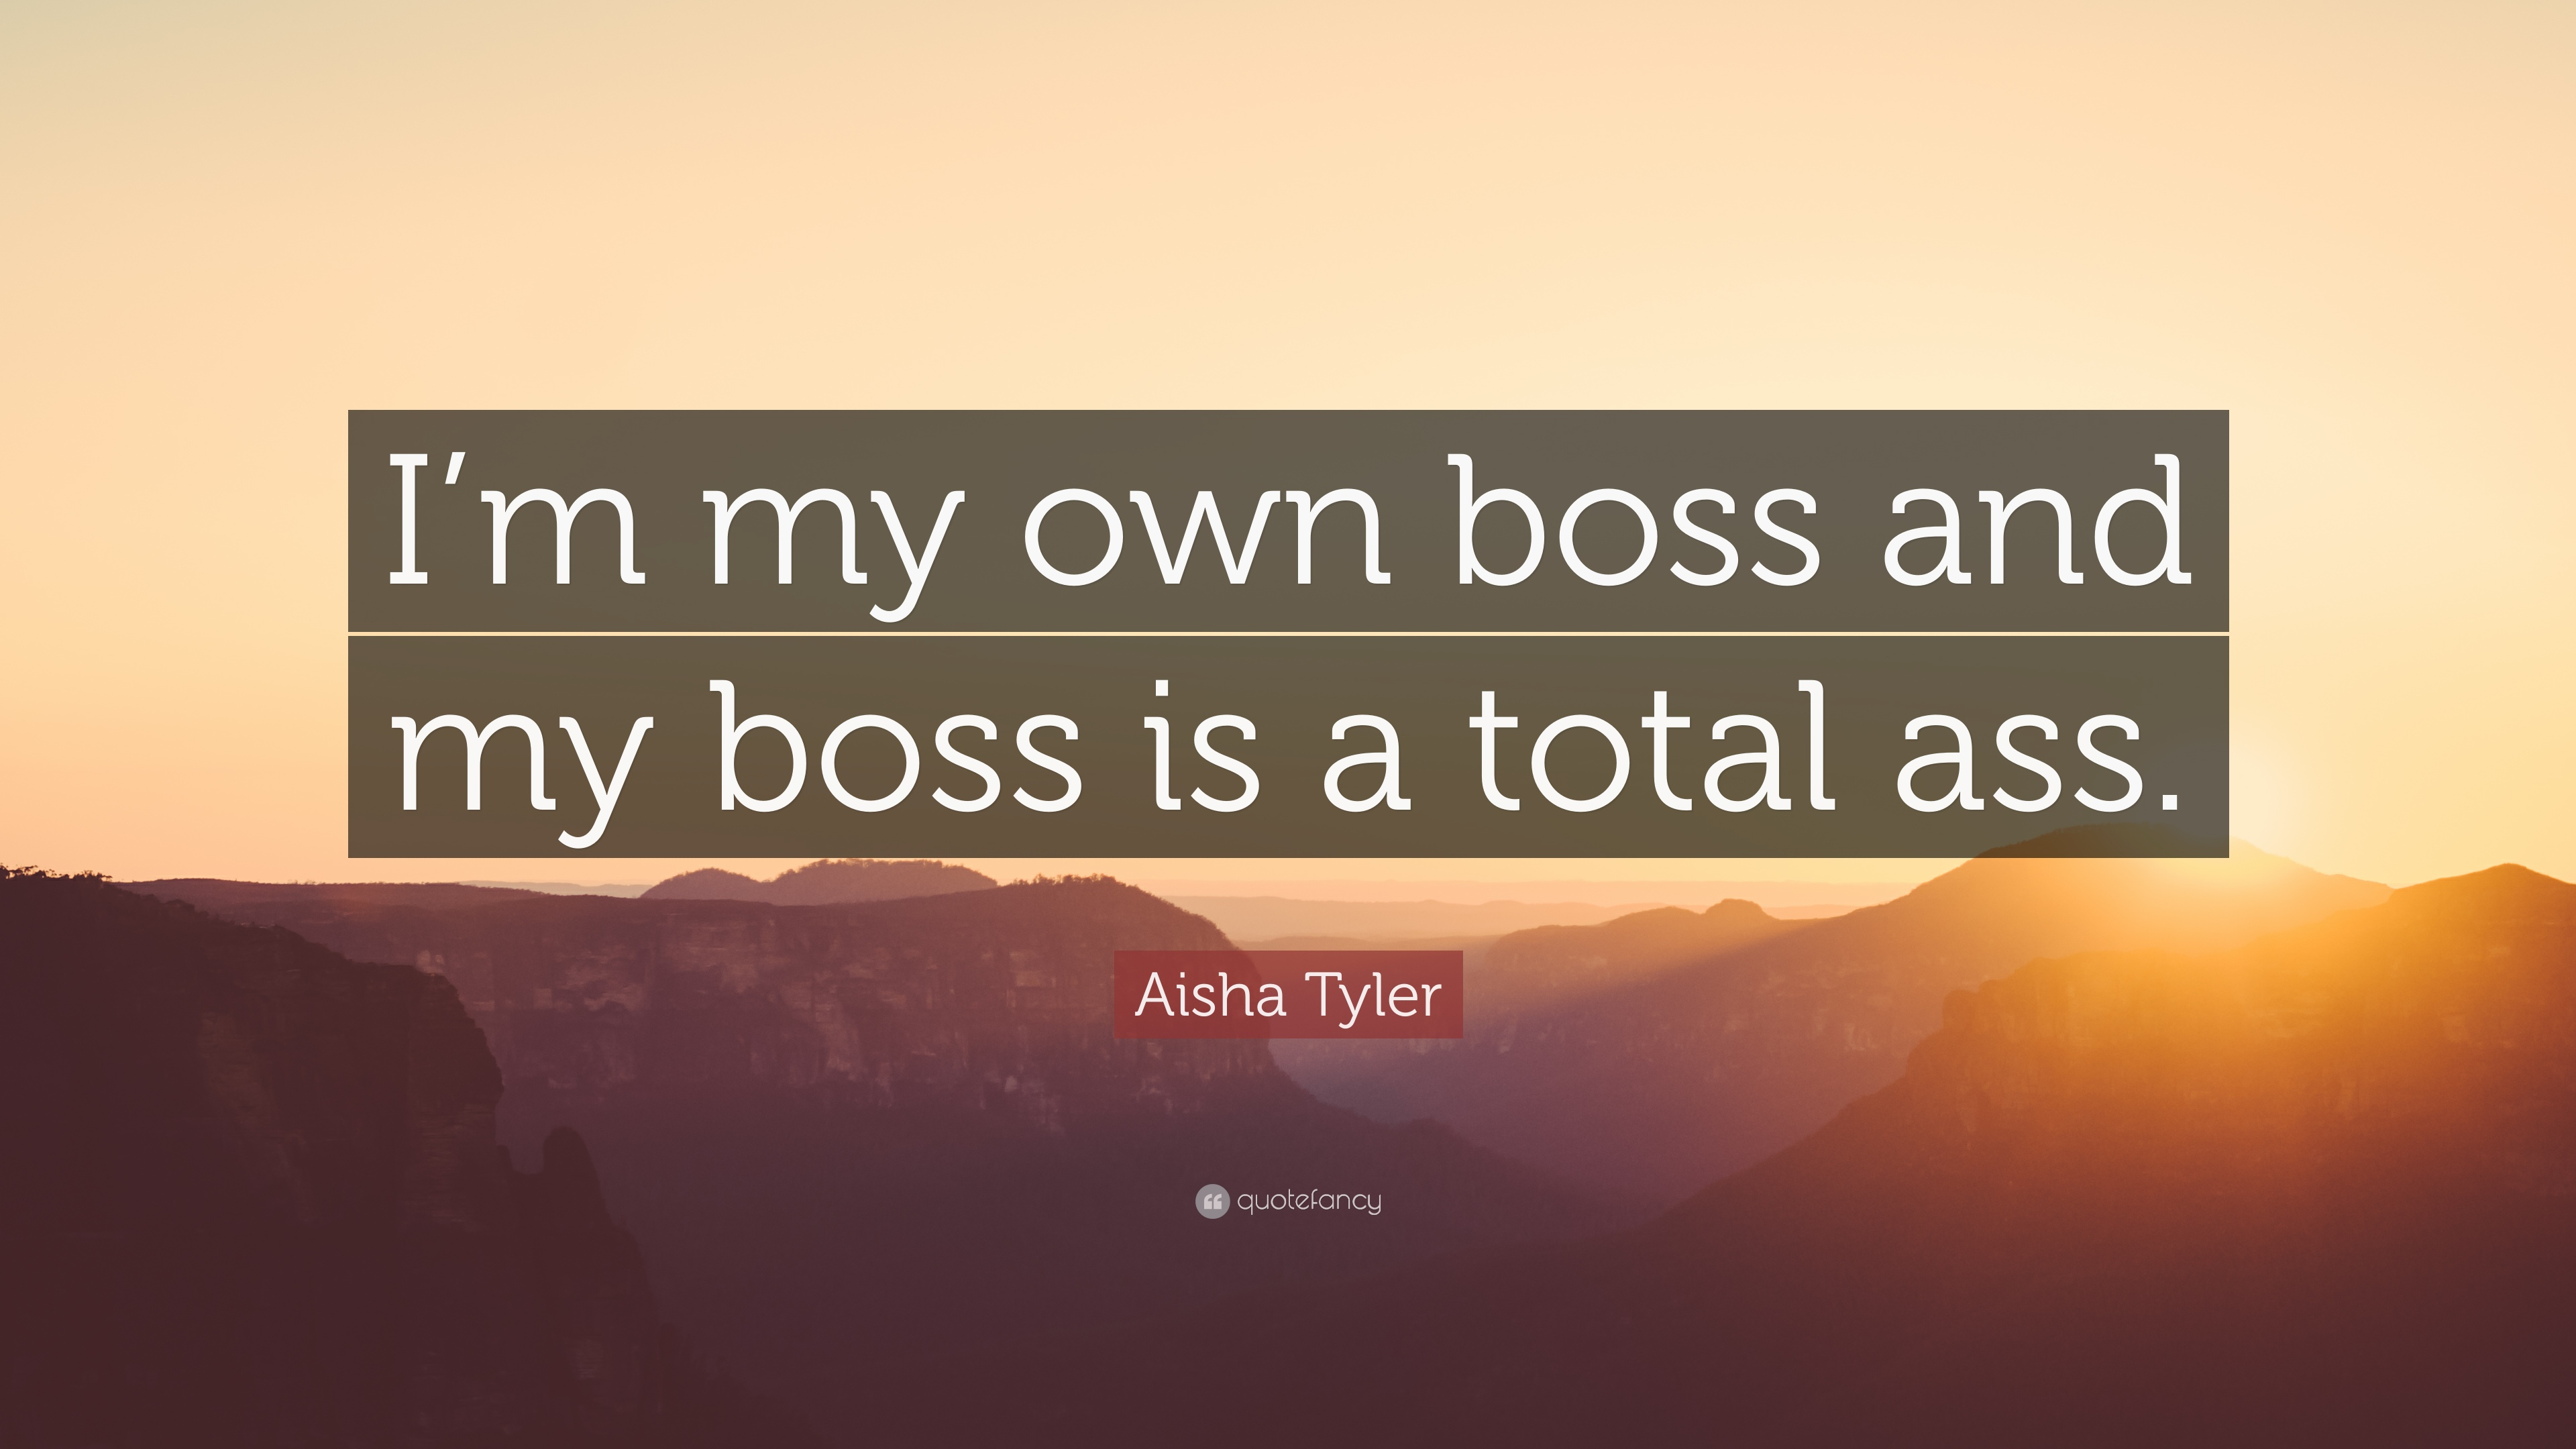 Aisha Tyler Quotes 58 Wallpapers Quotefancy